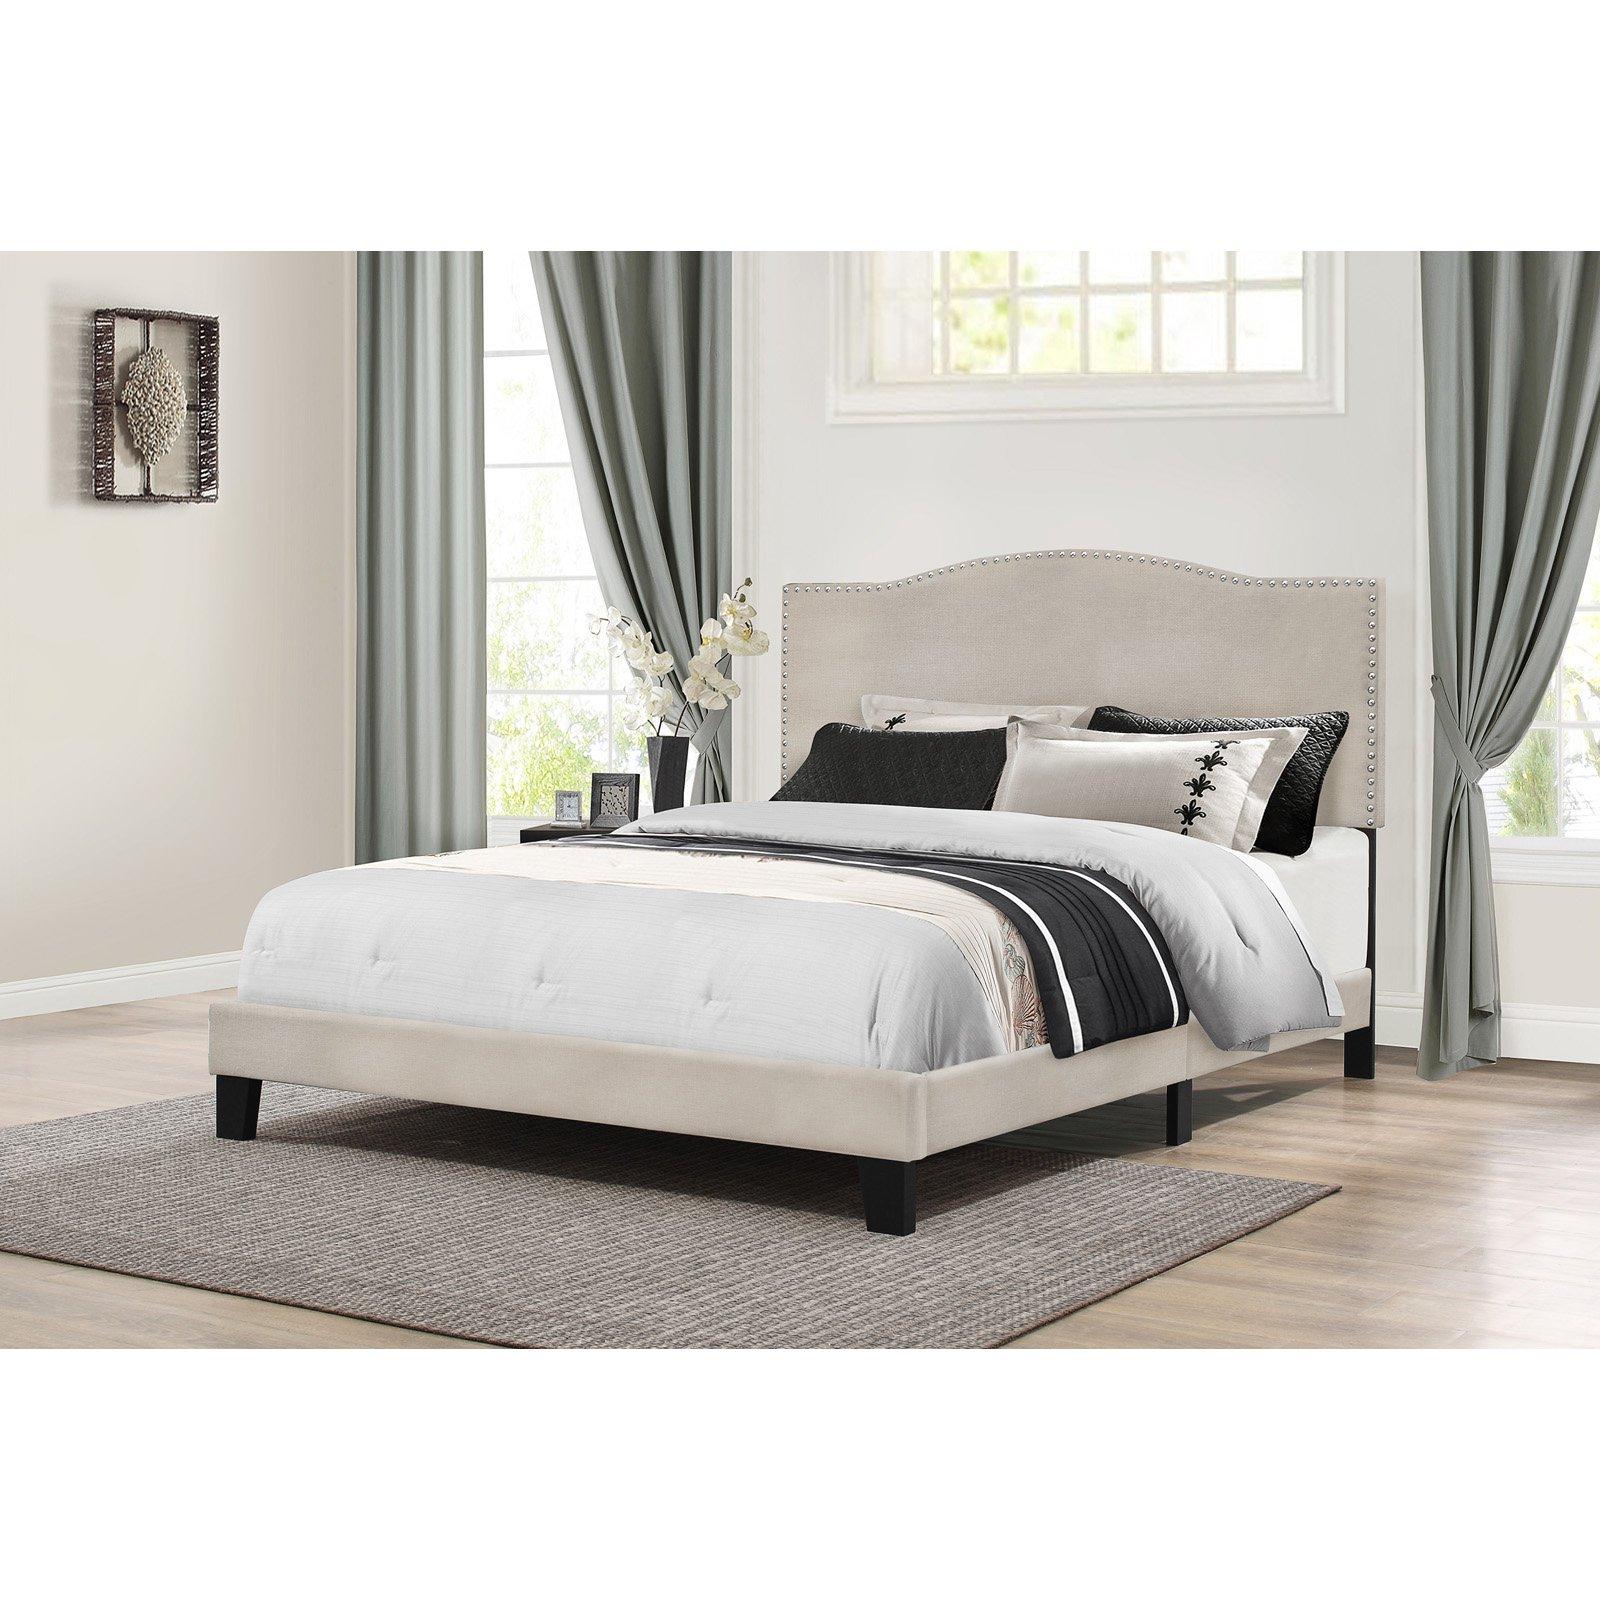 Hillsdale Furniture Kiley Full Bed, Fog